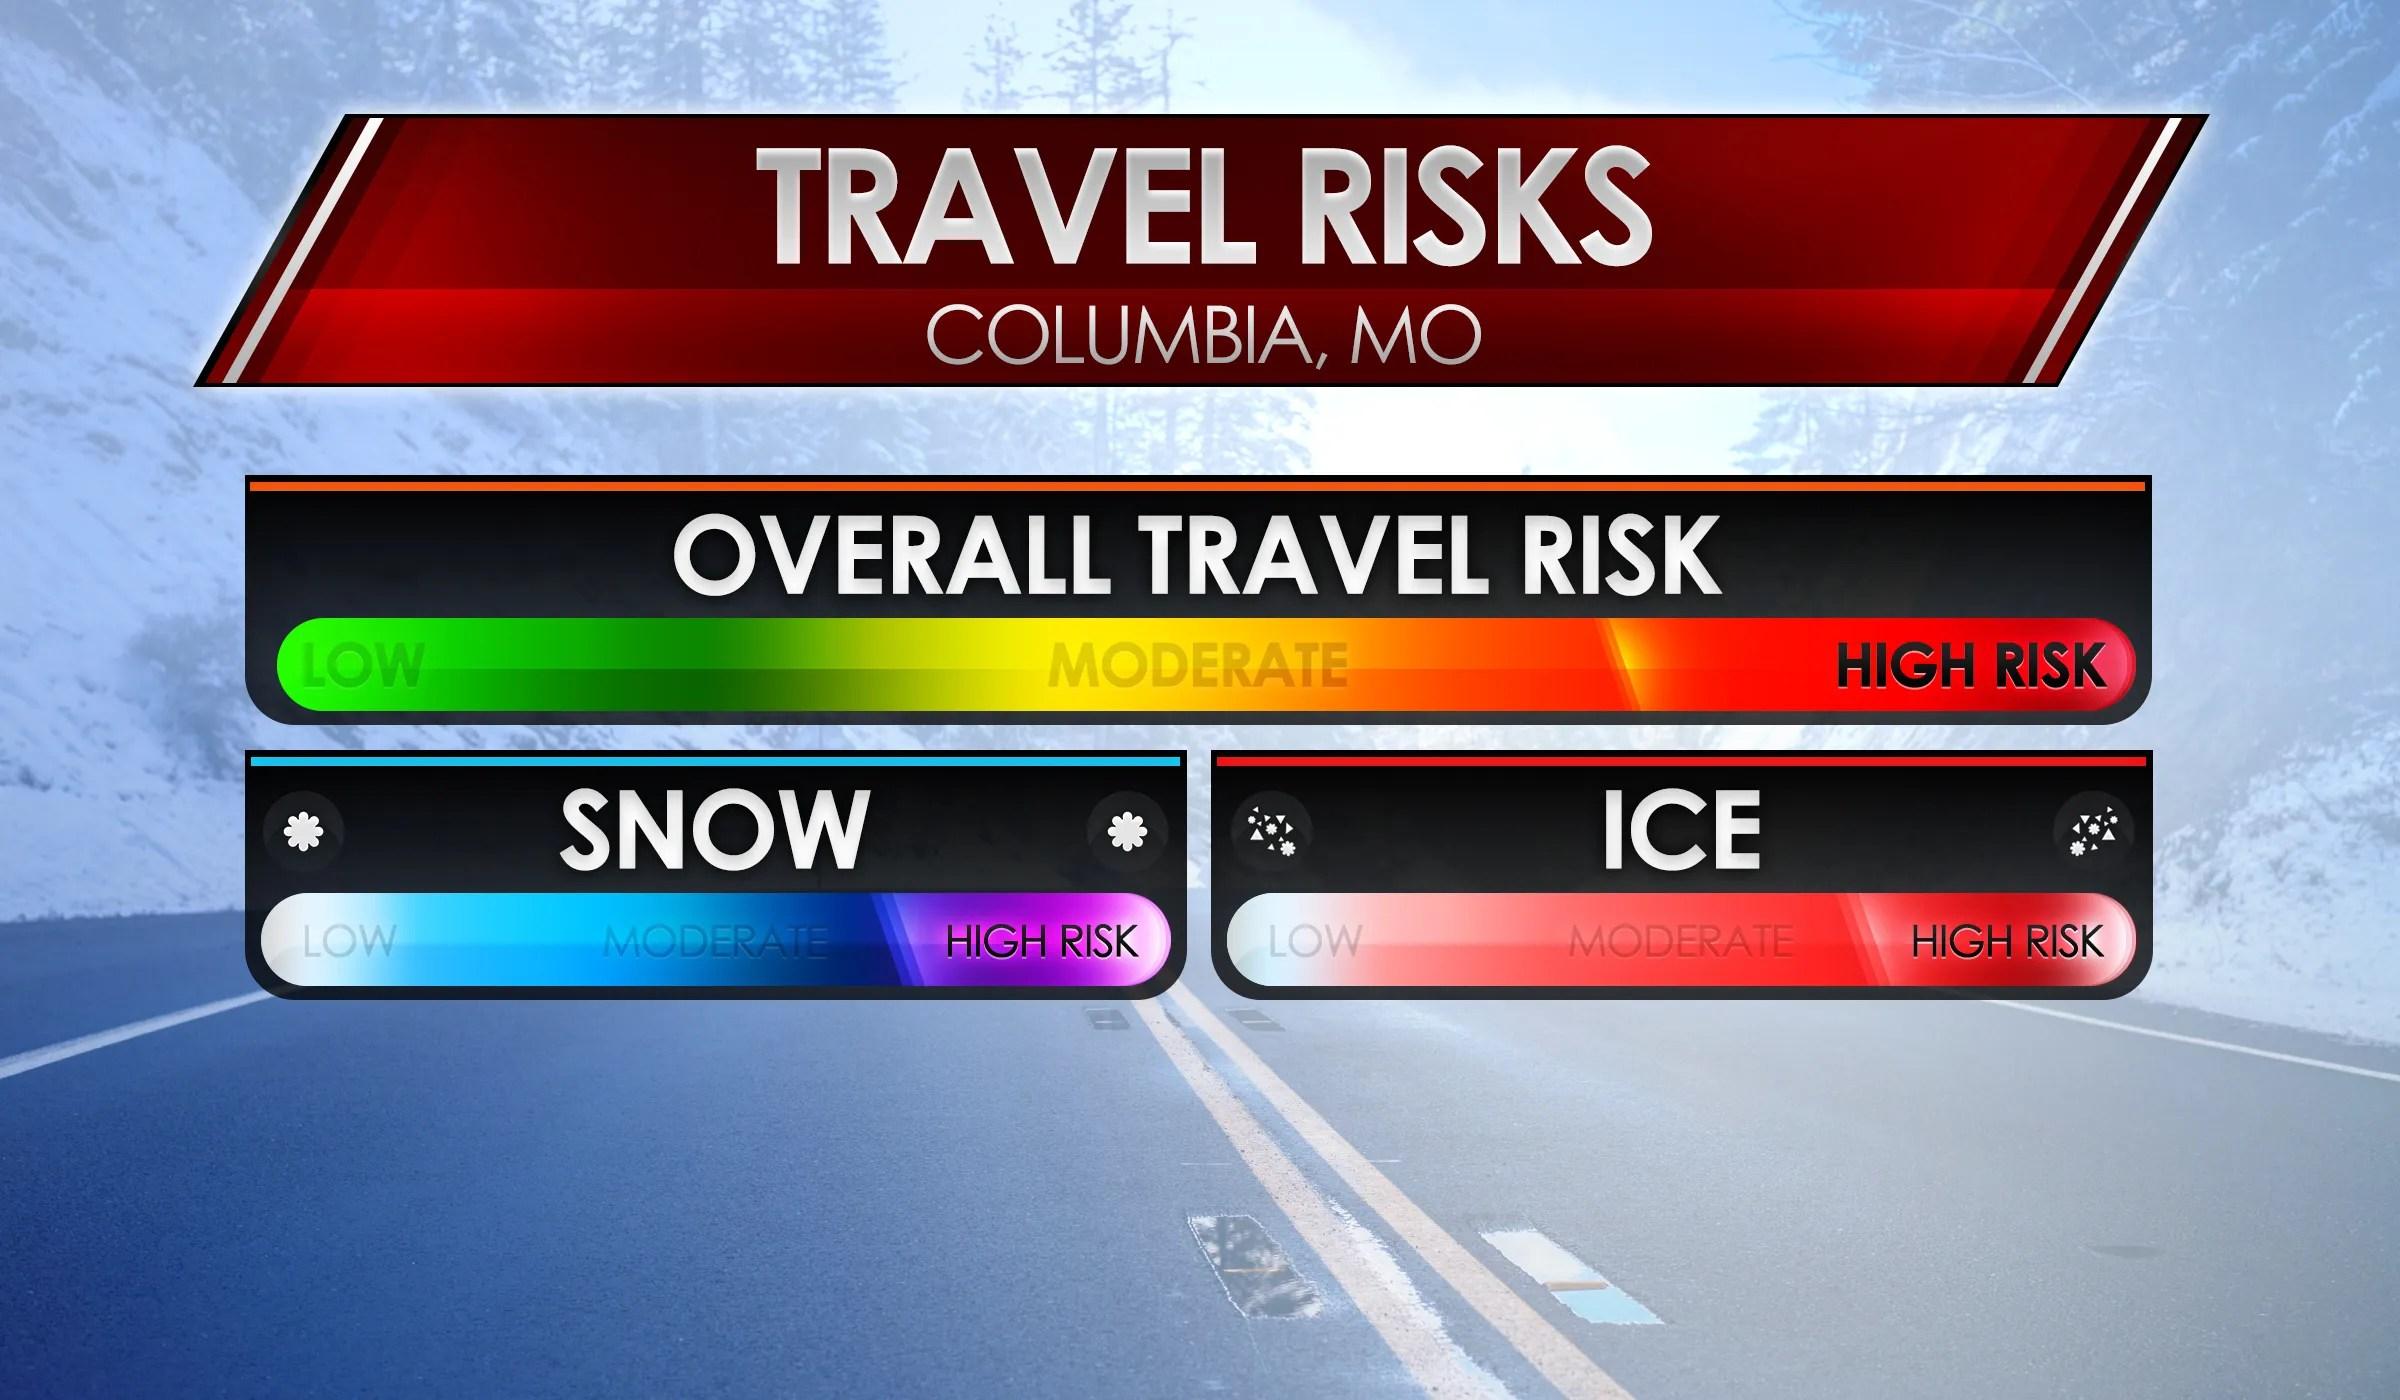 Travel Risk Columbia